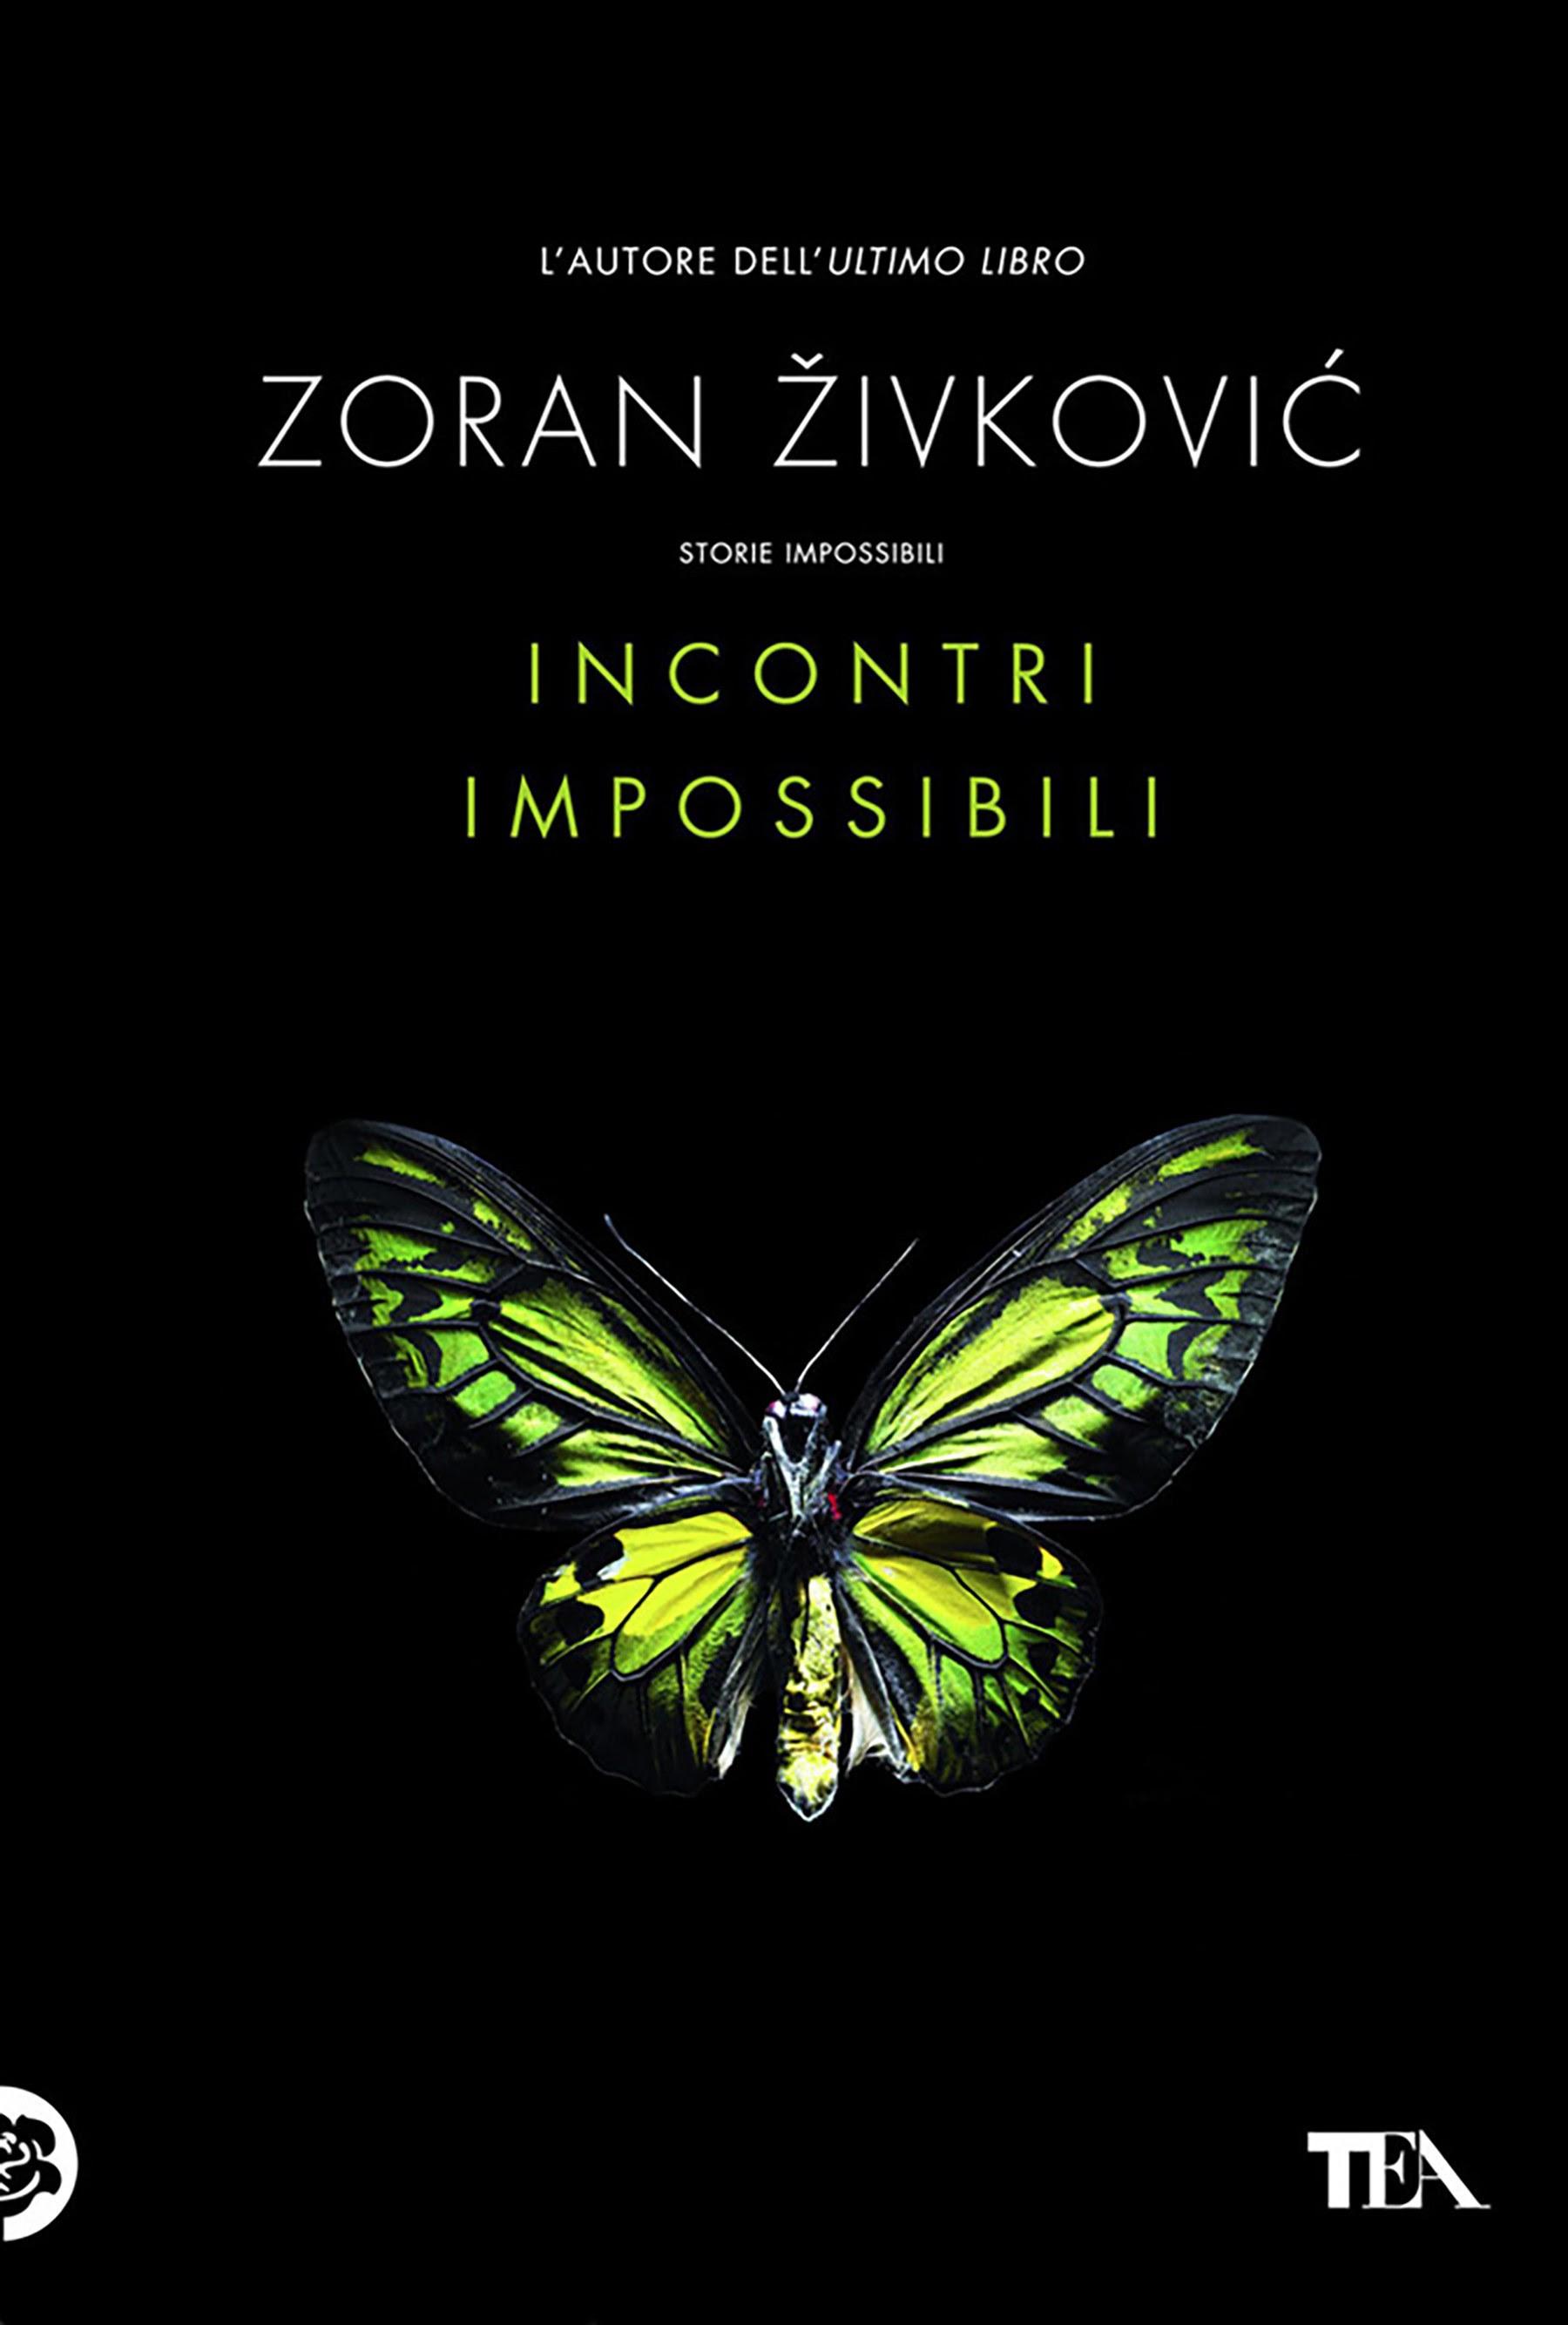 http://alessandria.bookrepublic.it/api/books/9788850235063/cover